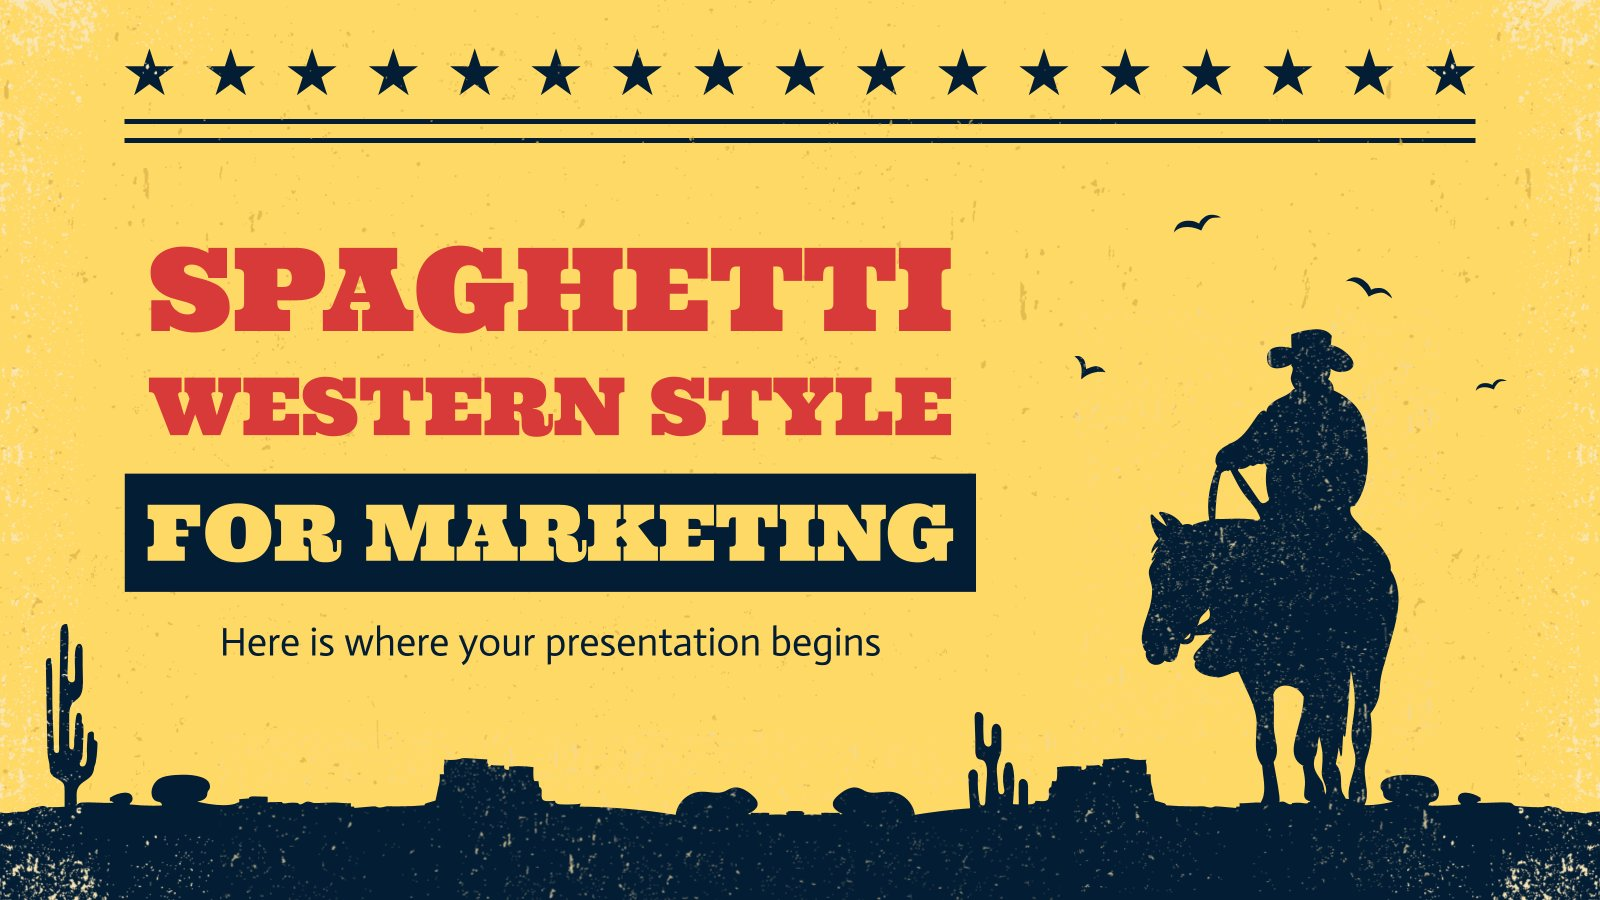 Spaghetti Western Style for Marketing presentation template